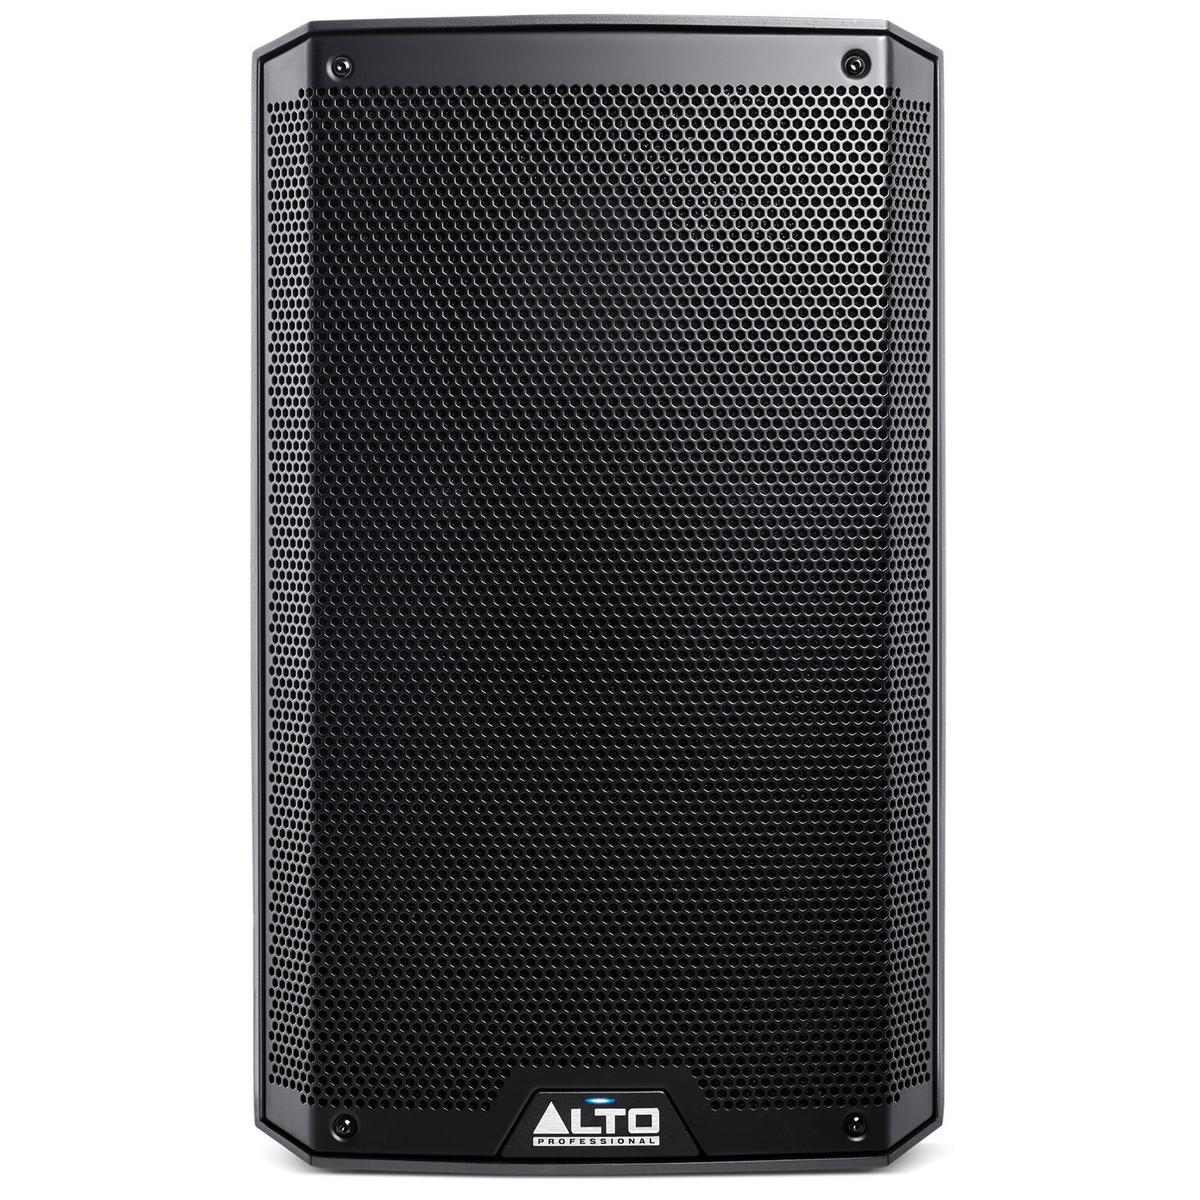 ALTO TRUESONIC TS210 3